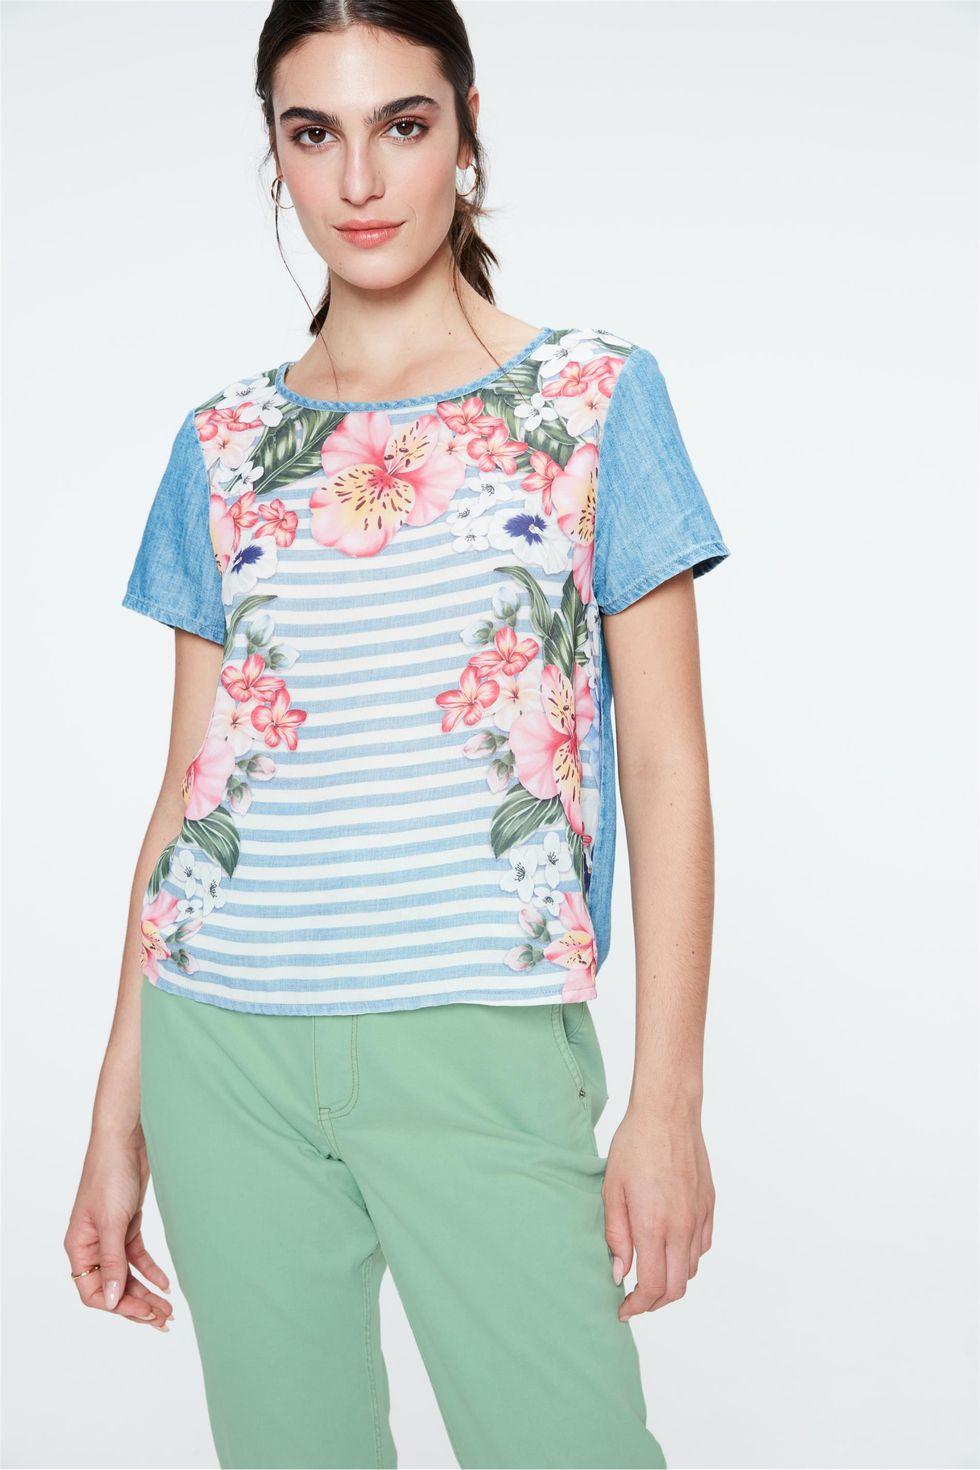 Blusa-Jeans-Manga-Curta-Estampa-Floral-Frente--